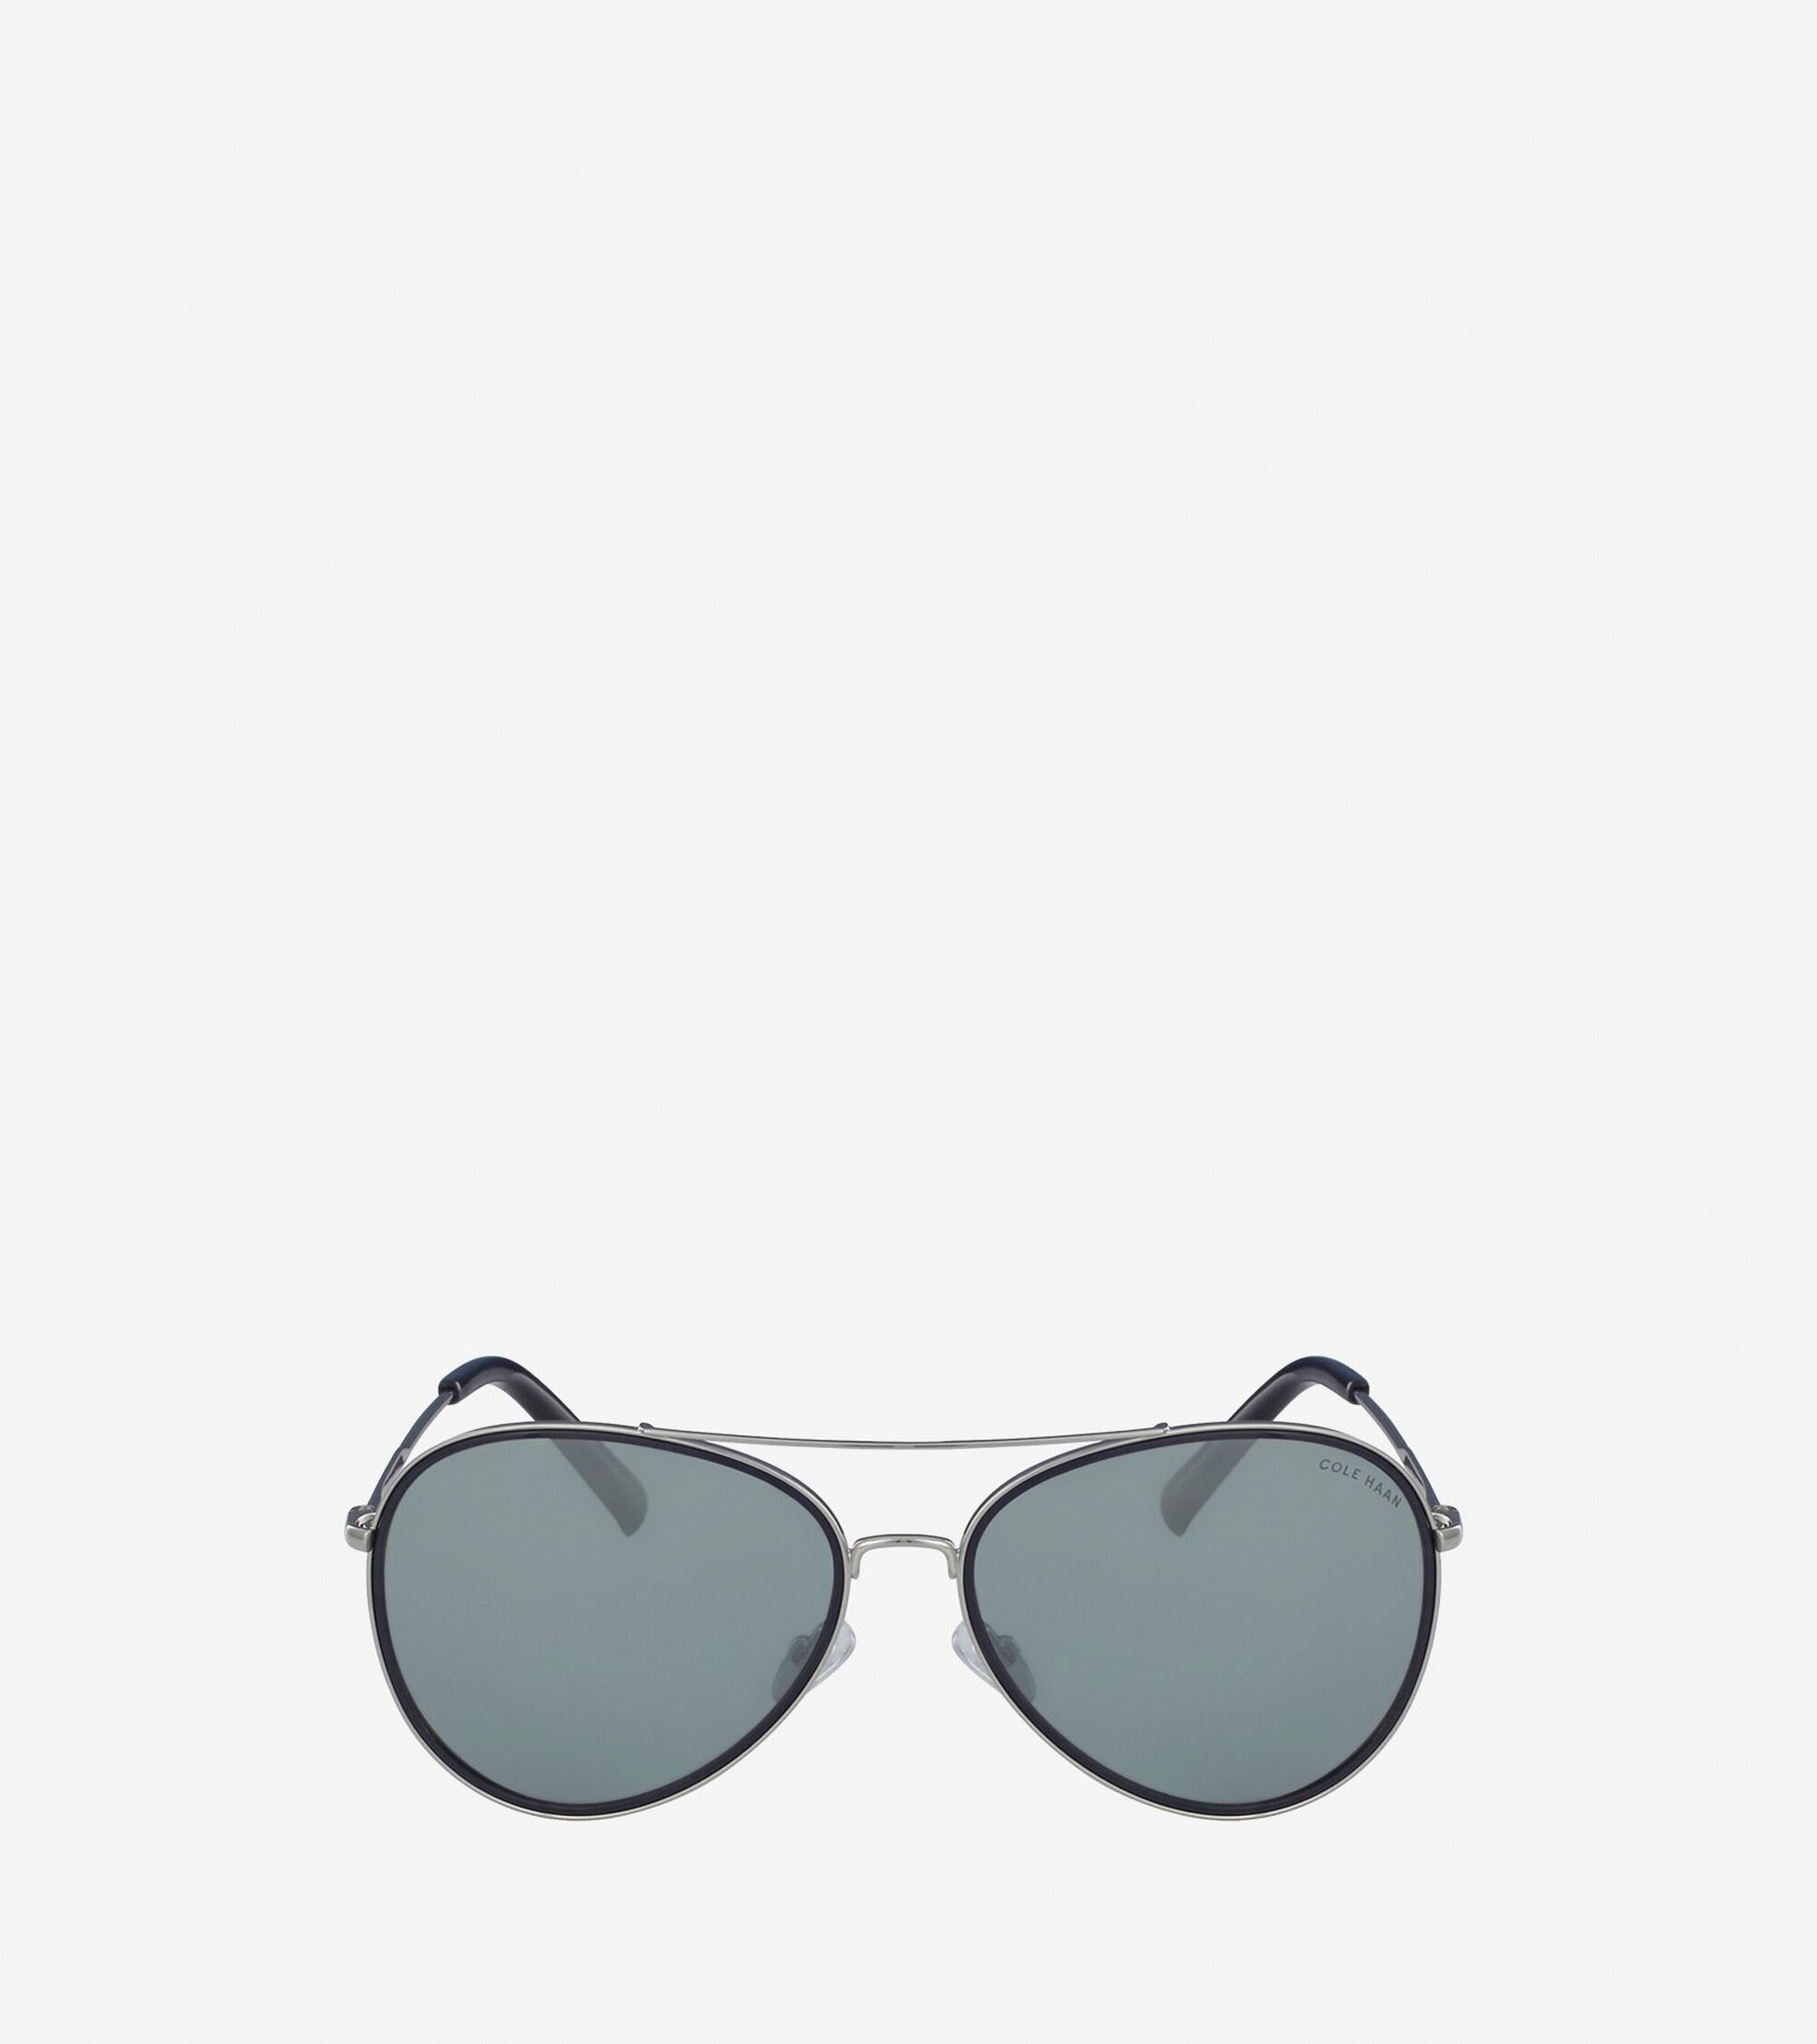 Women\'s Grand Aviator Sunglasses in Silver | Cole Haan